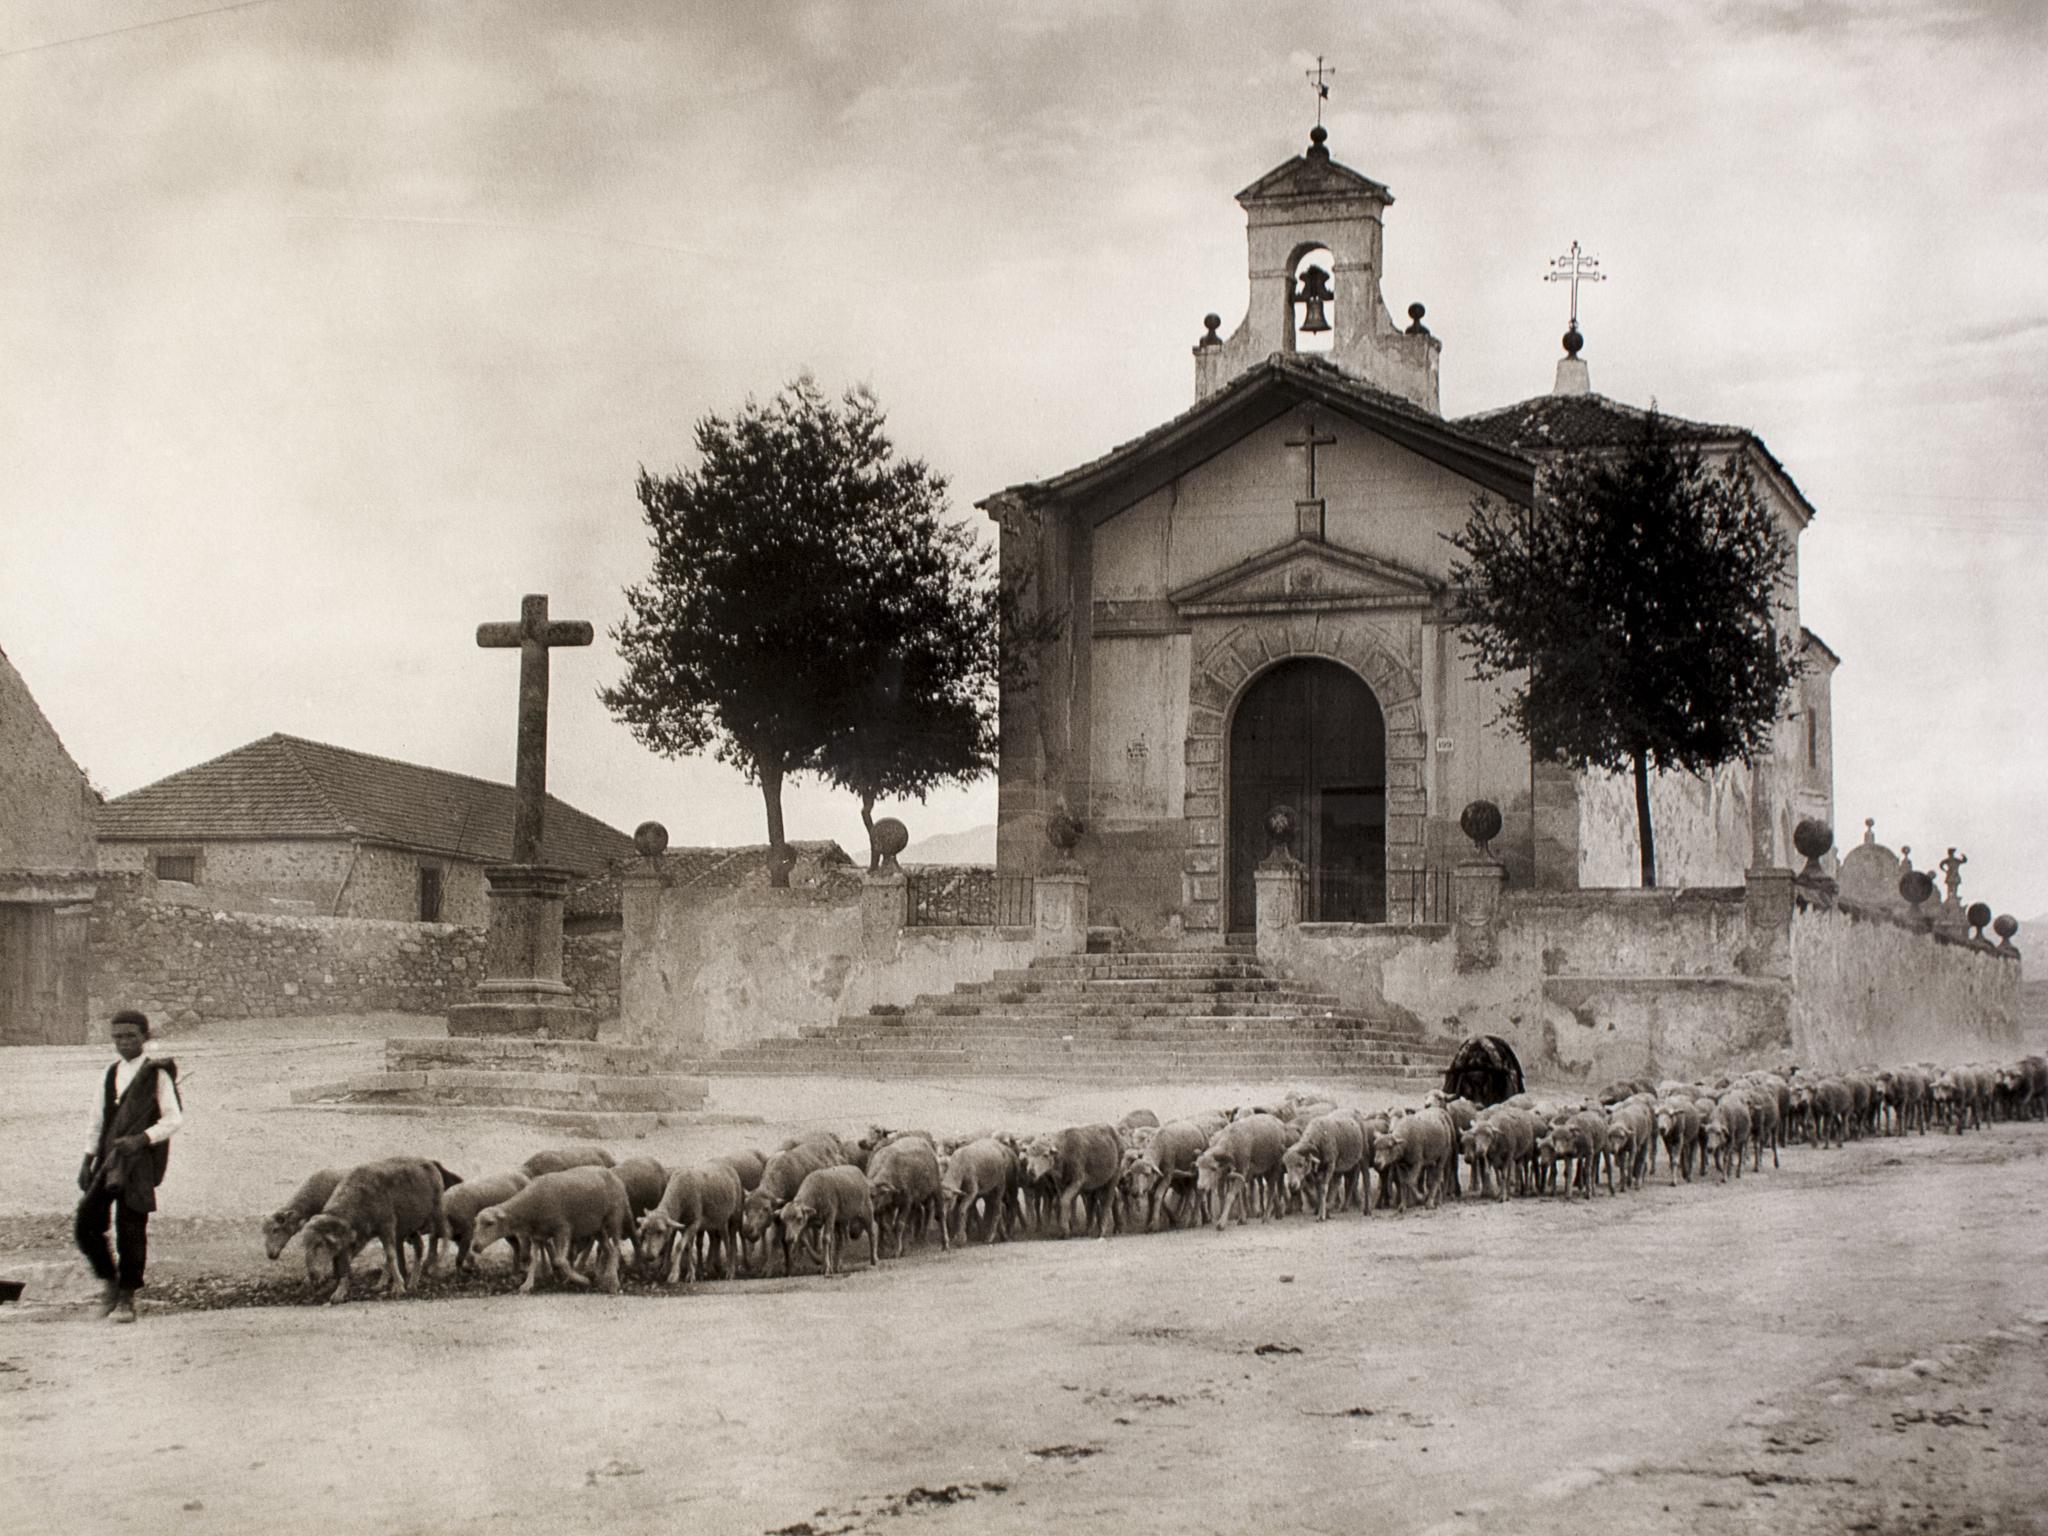 A Glimpse into Spain's Rural Past